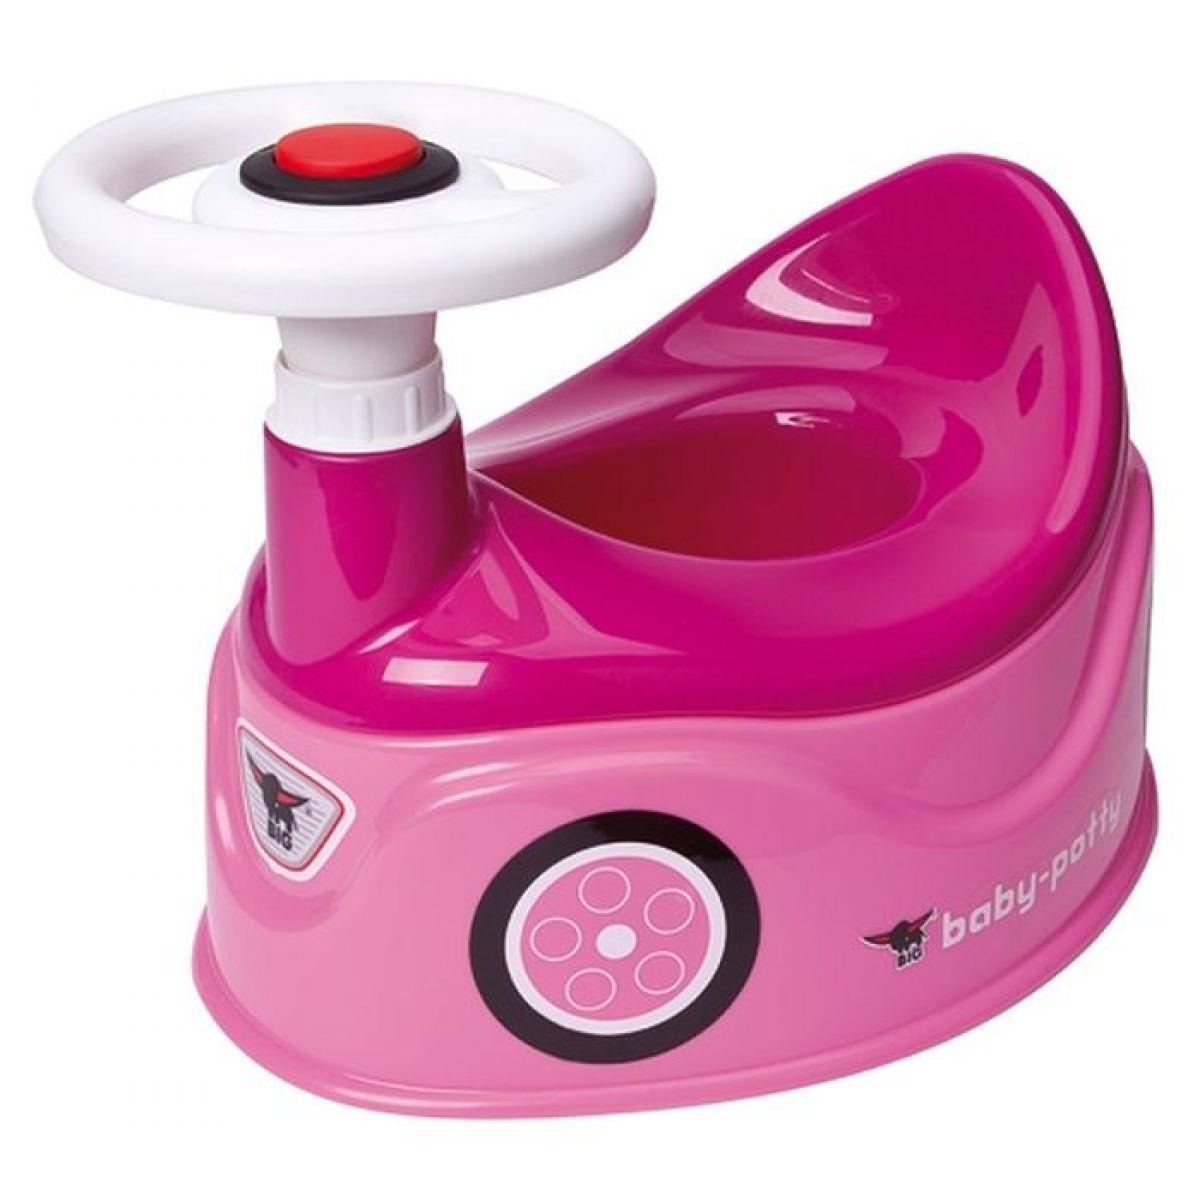 BIG Nočník s volantem růžový